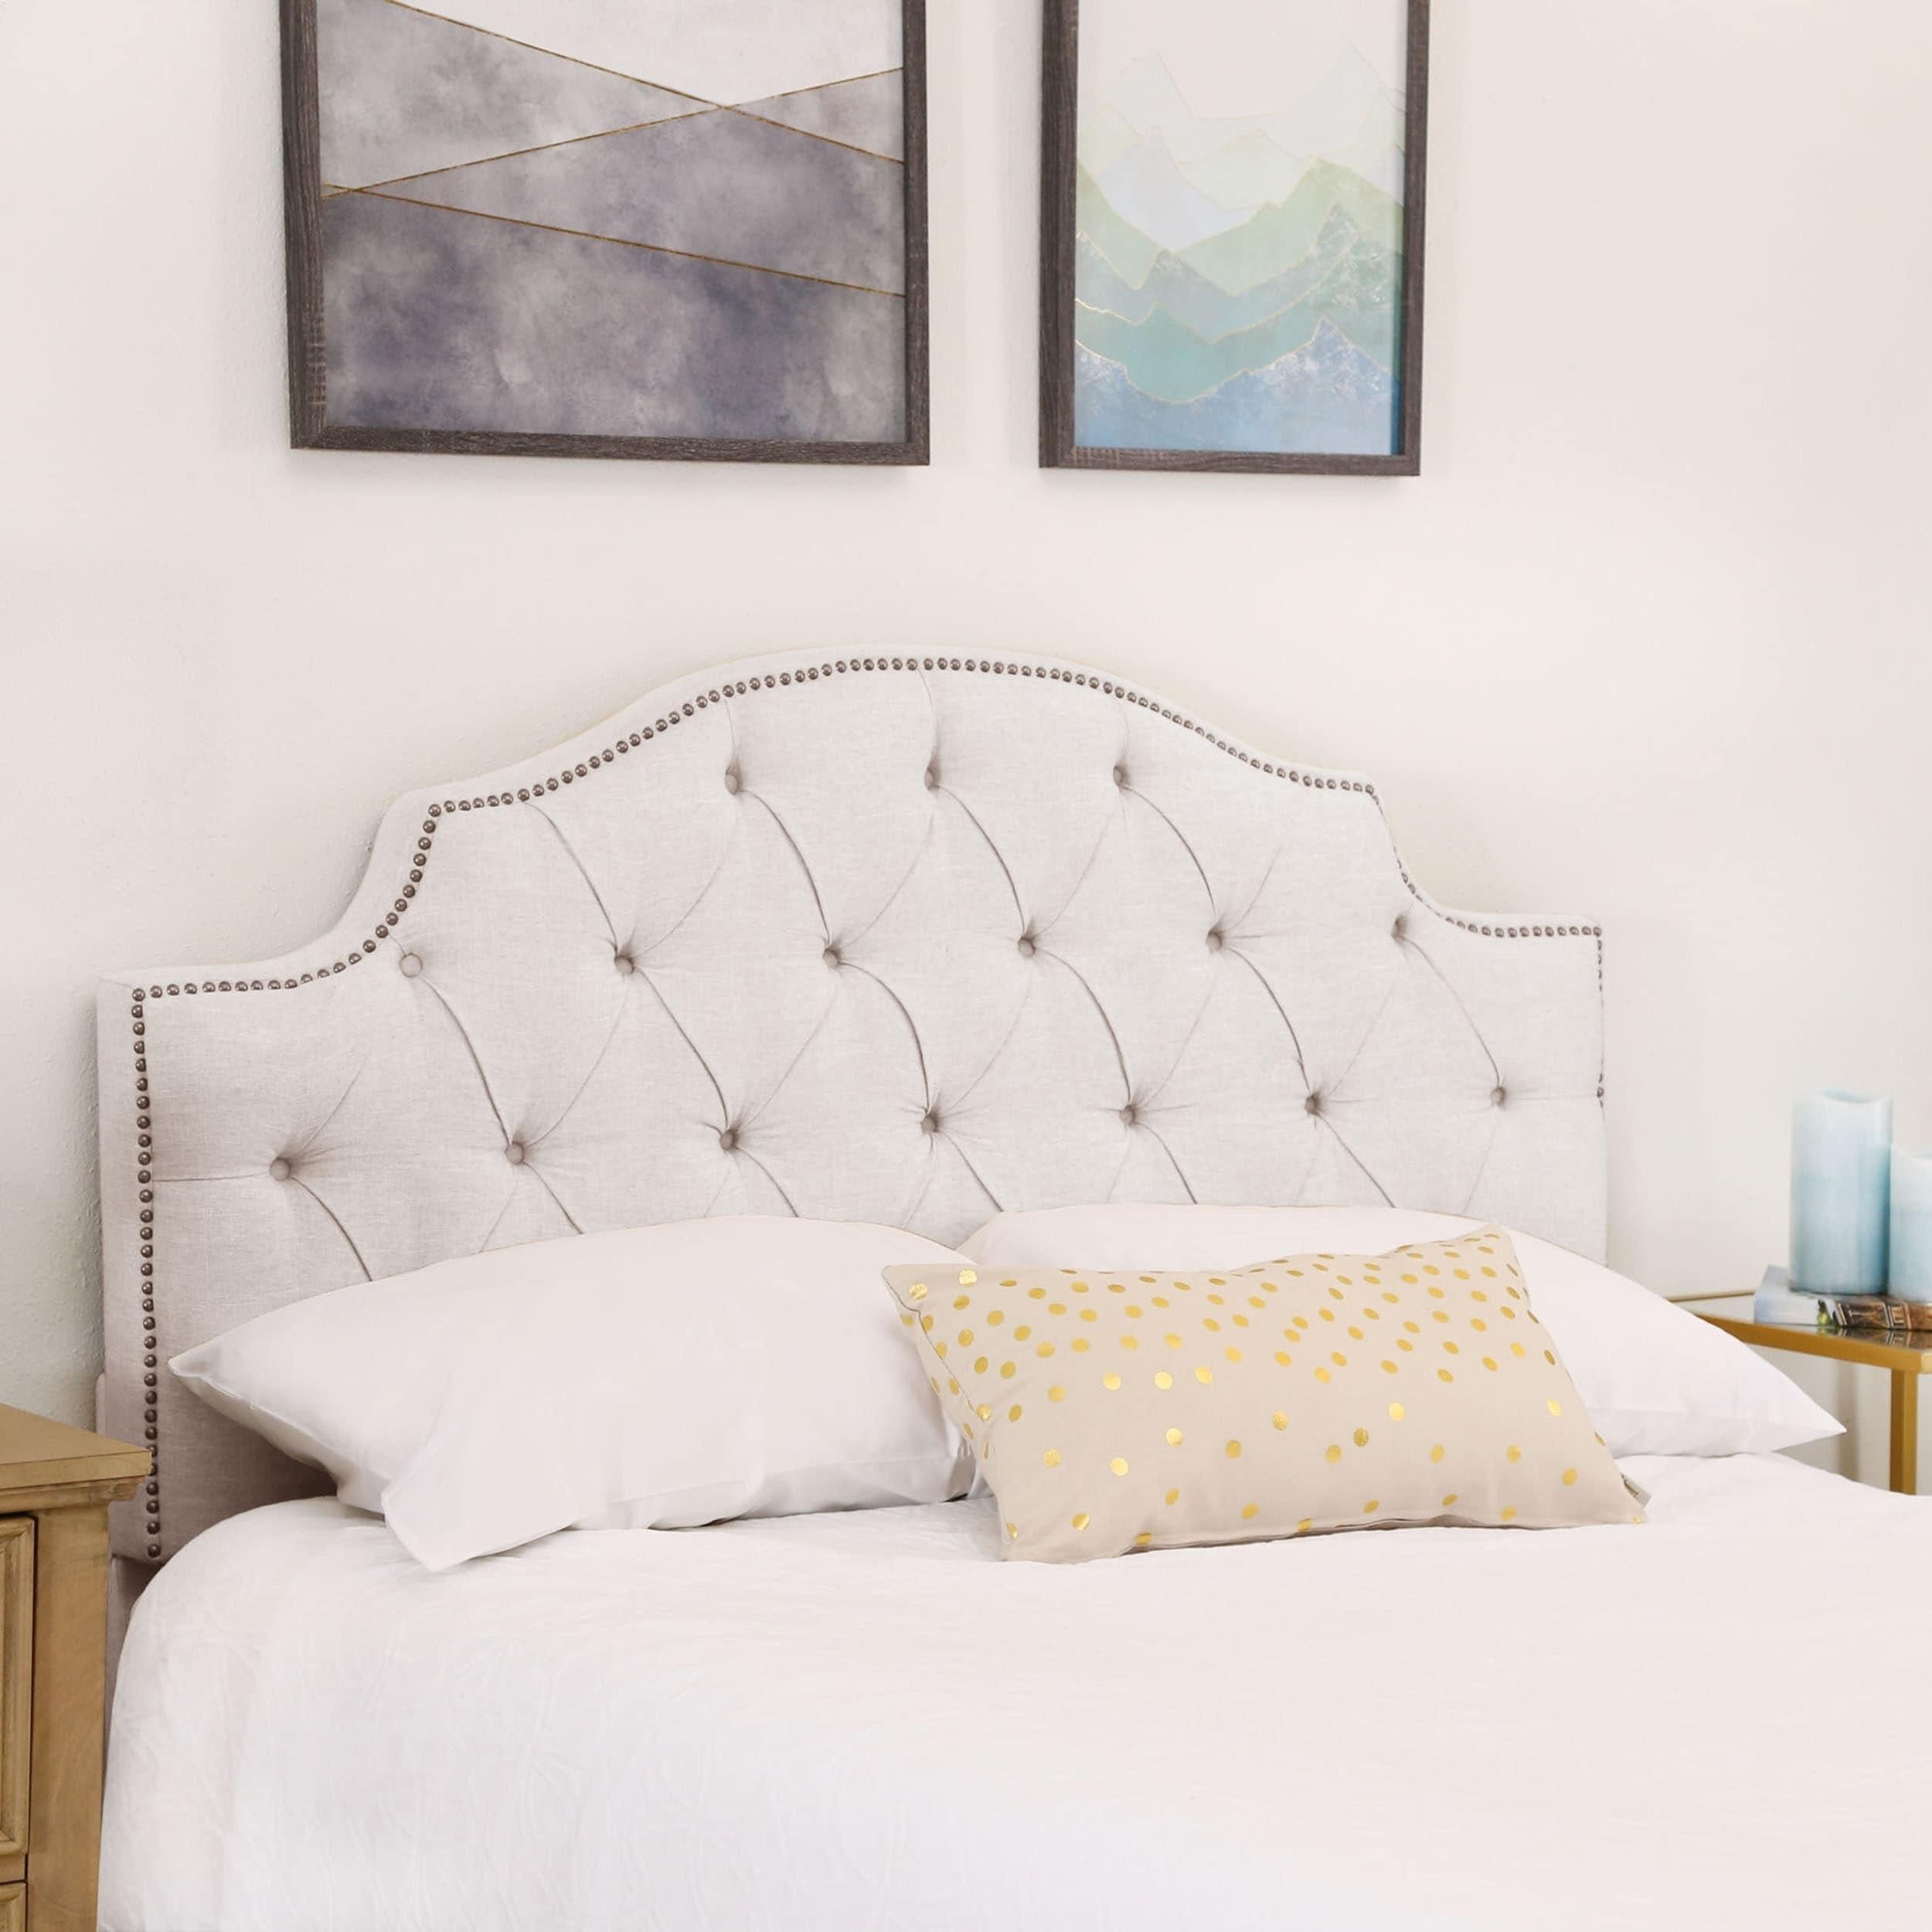 Abbyson Royal Tufted White Queen Full Linen Headboard On Sale Overstock 10147617